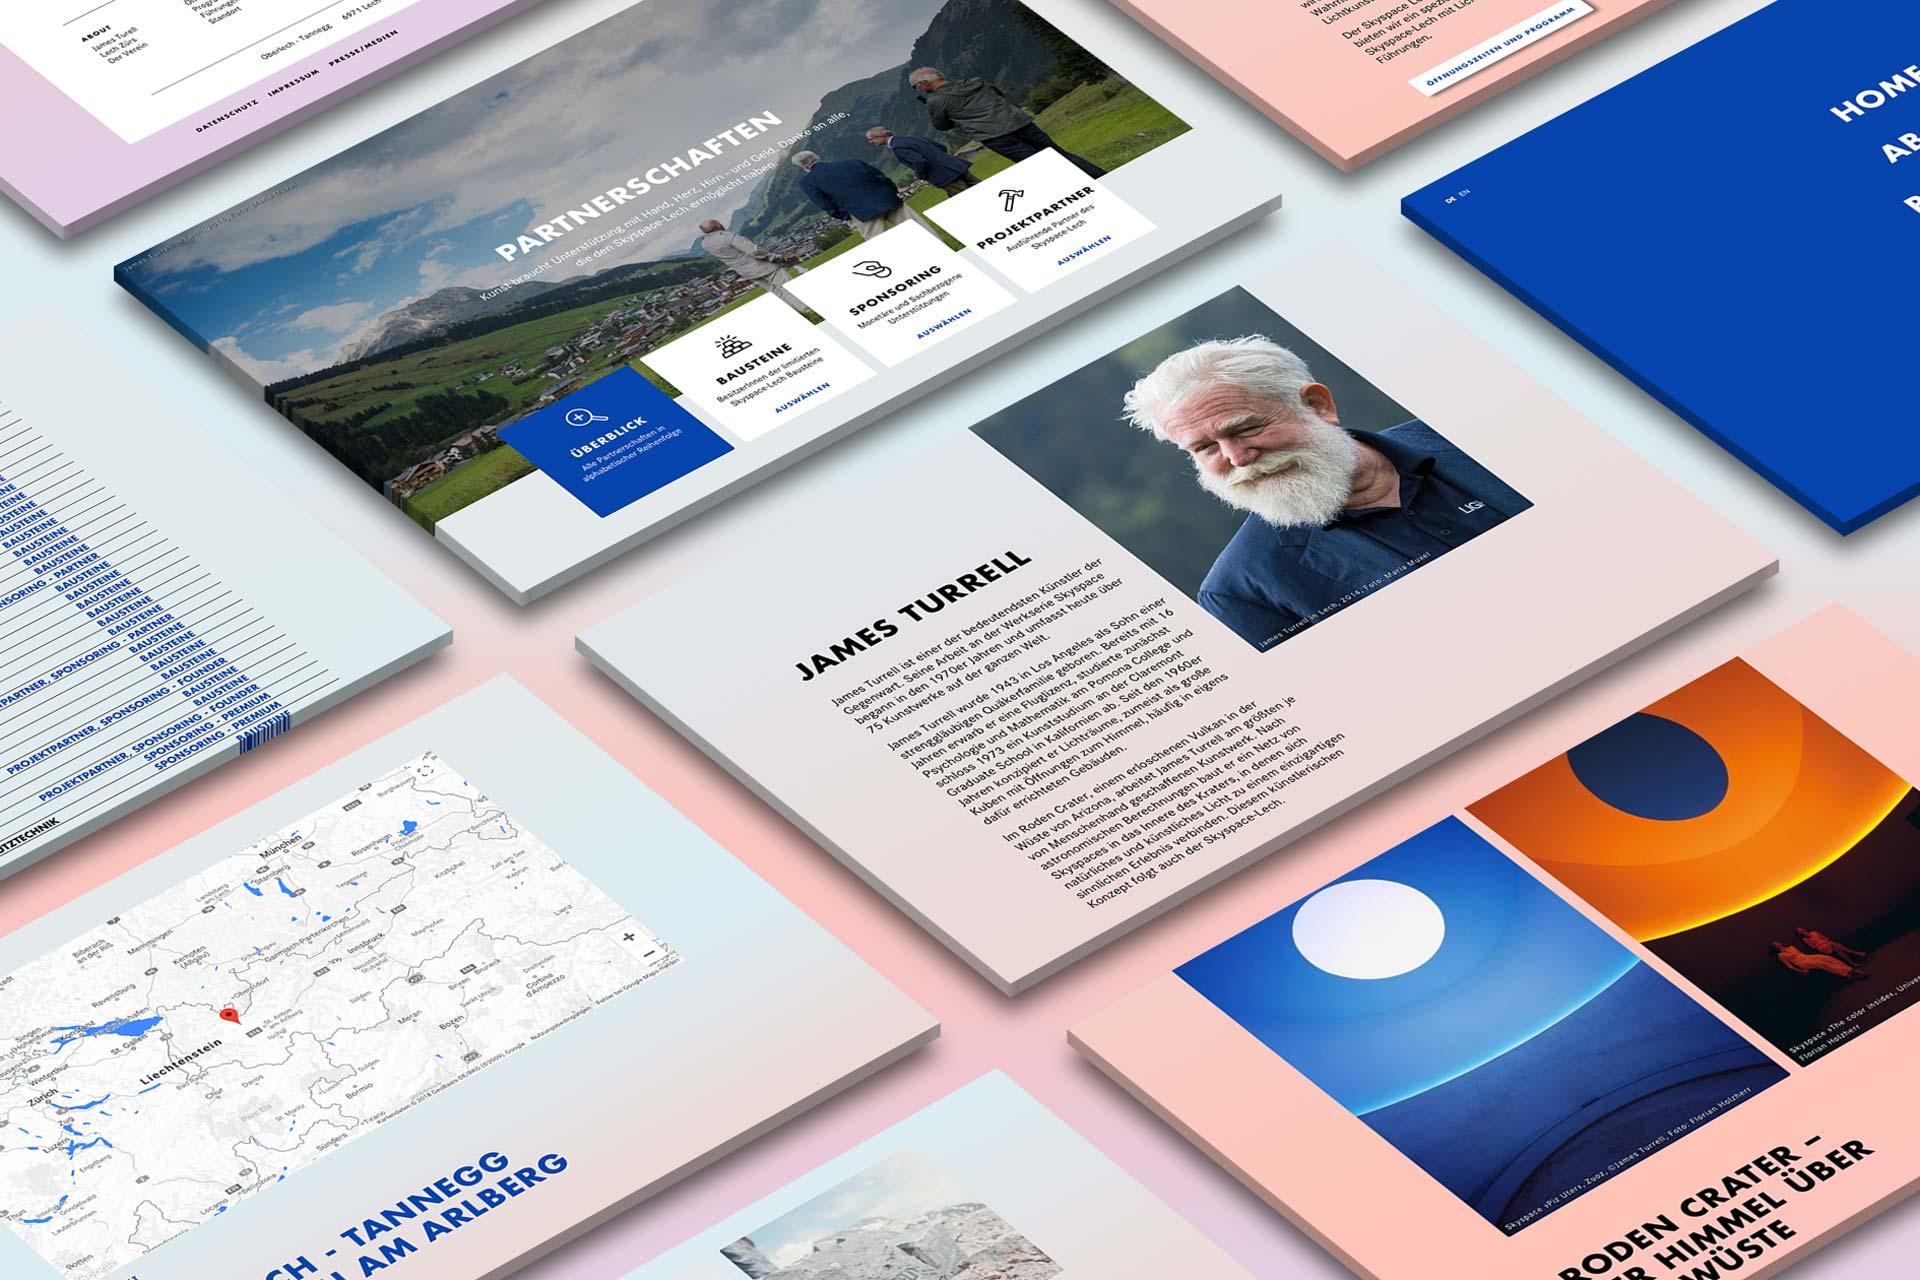 Übersicht, Webdesign skyspace Lech, UI, UX, Web, James Turrell, Kunst, Bernhard Hafele